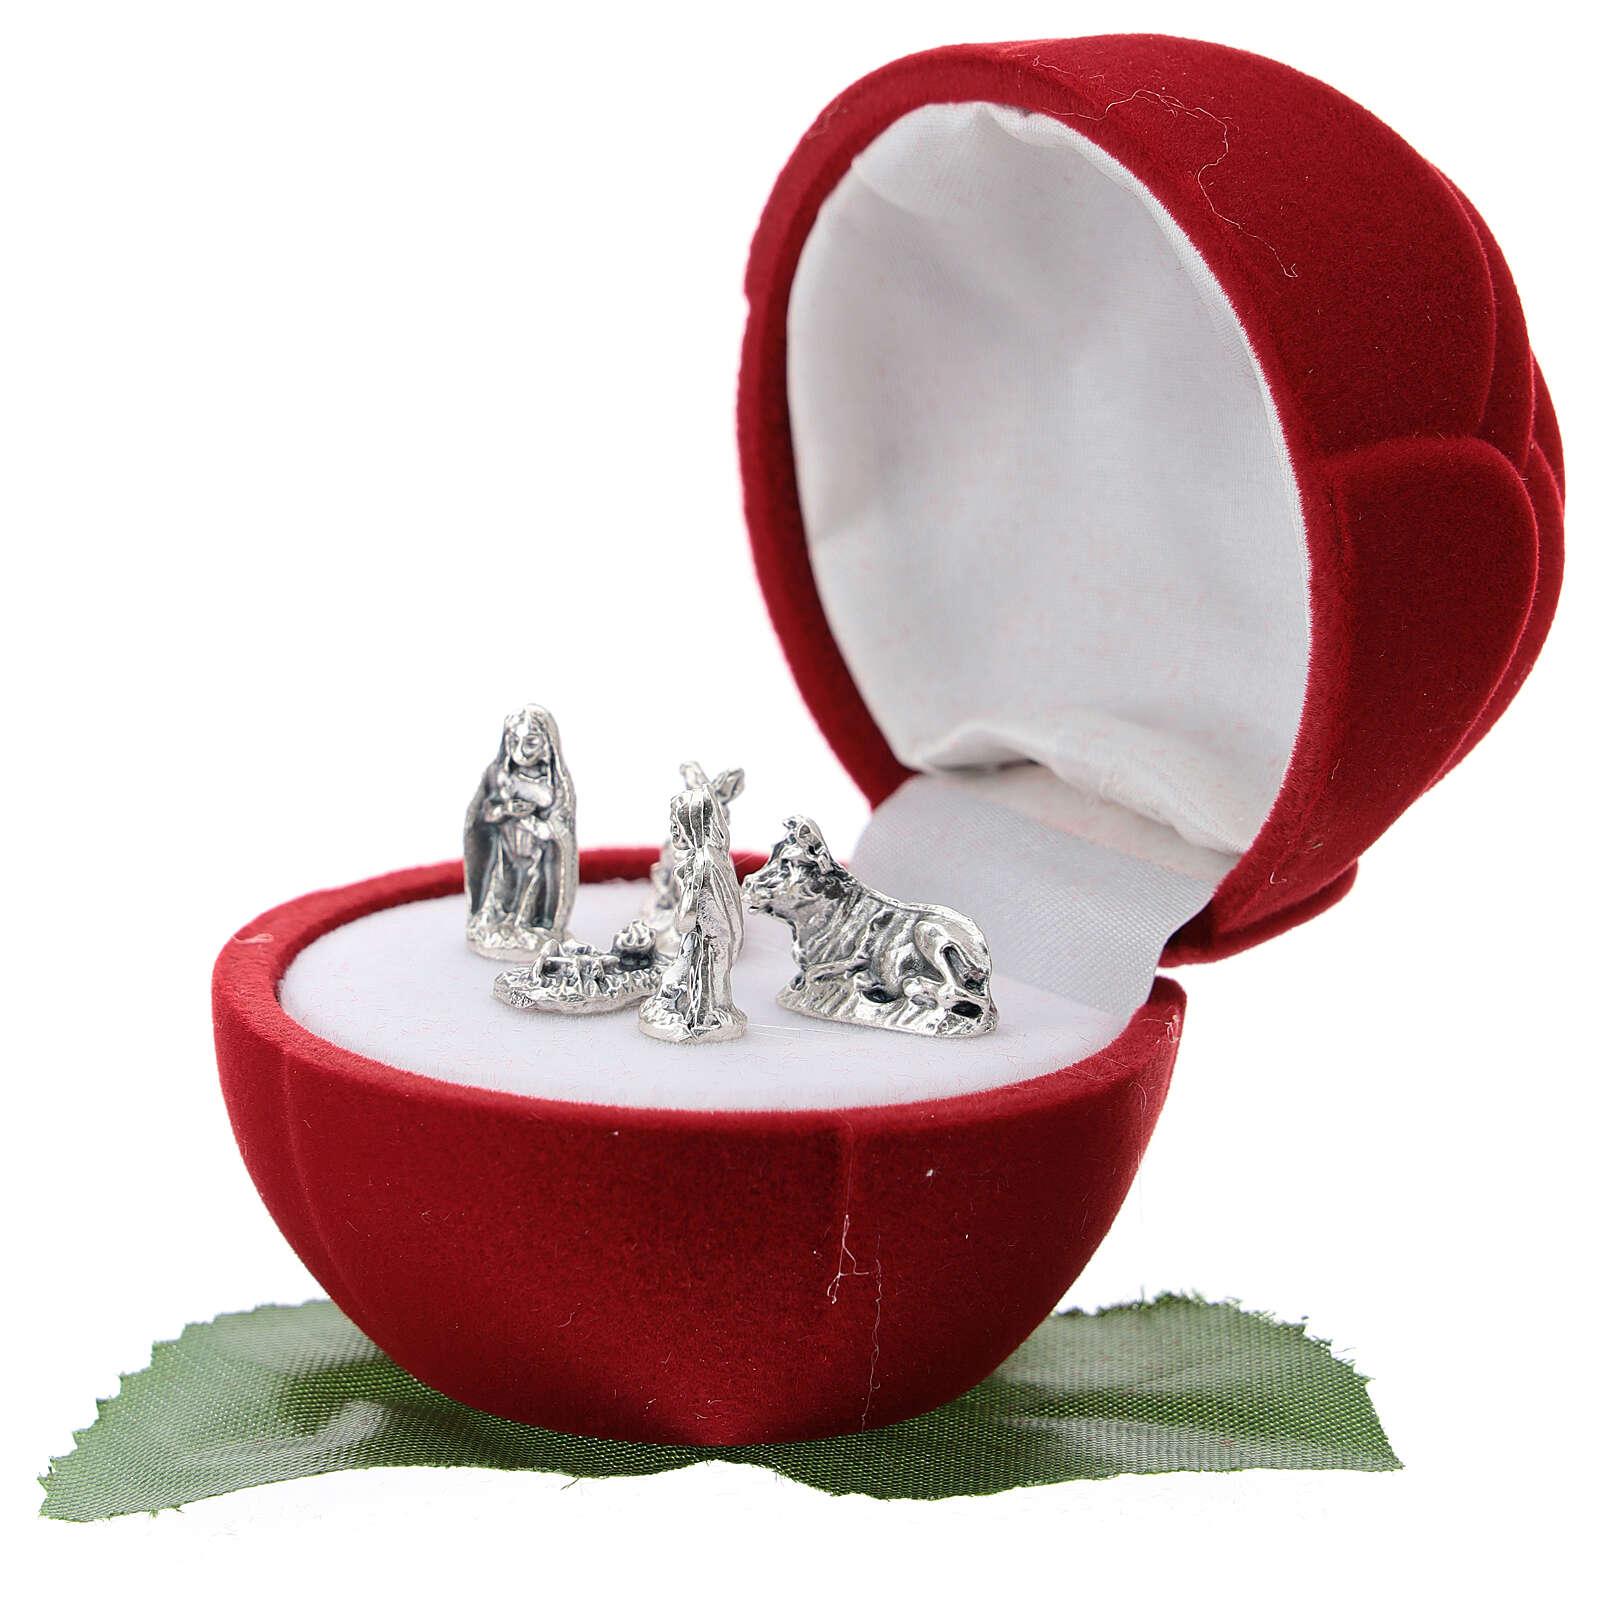 Small rose-shaper red velvet case with Nativity 3